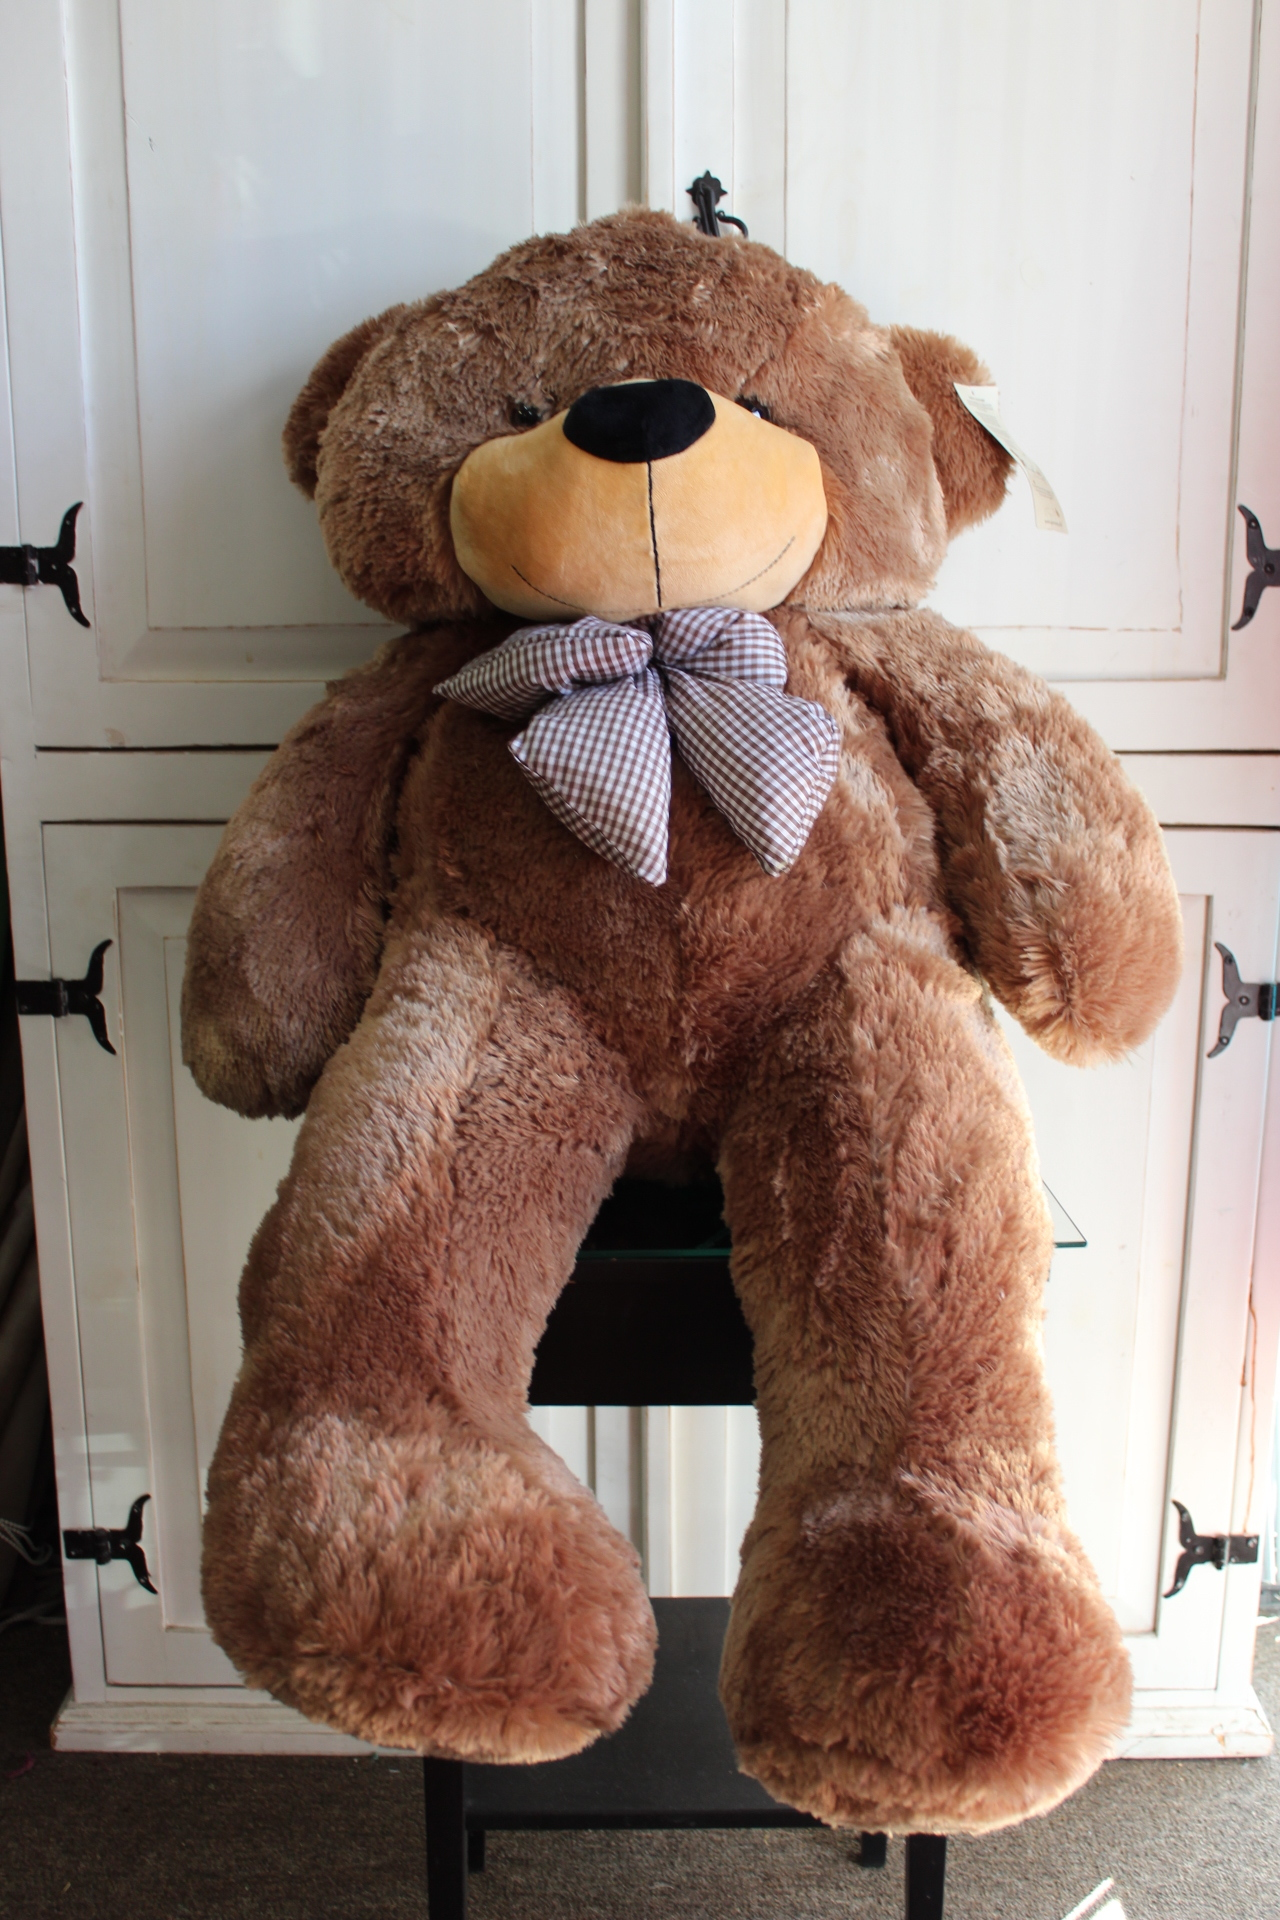 "47"" - Super Cute & Huggable, Mocha Colored Big Plush Teddy Bear.  $175.00"